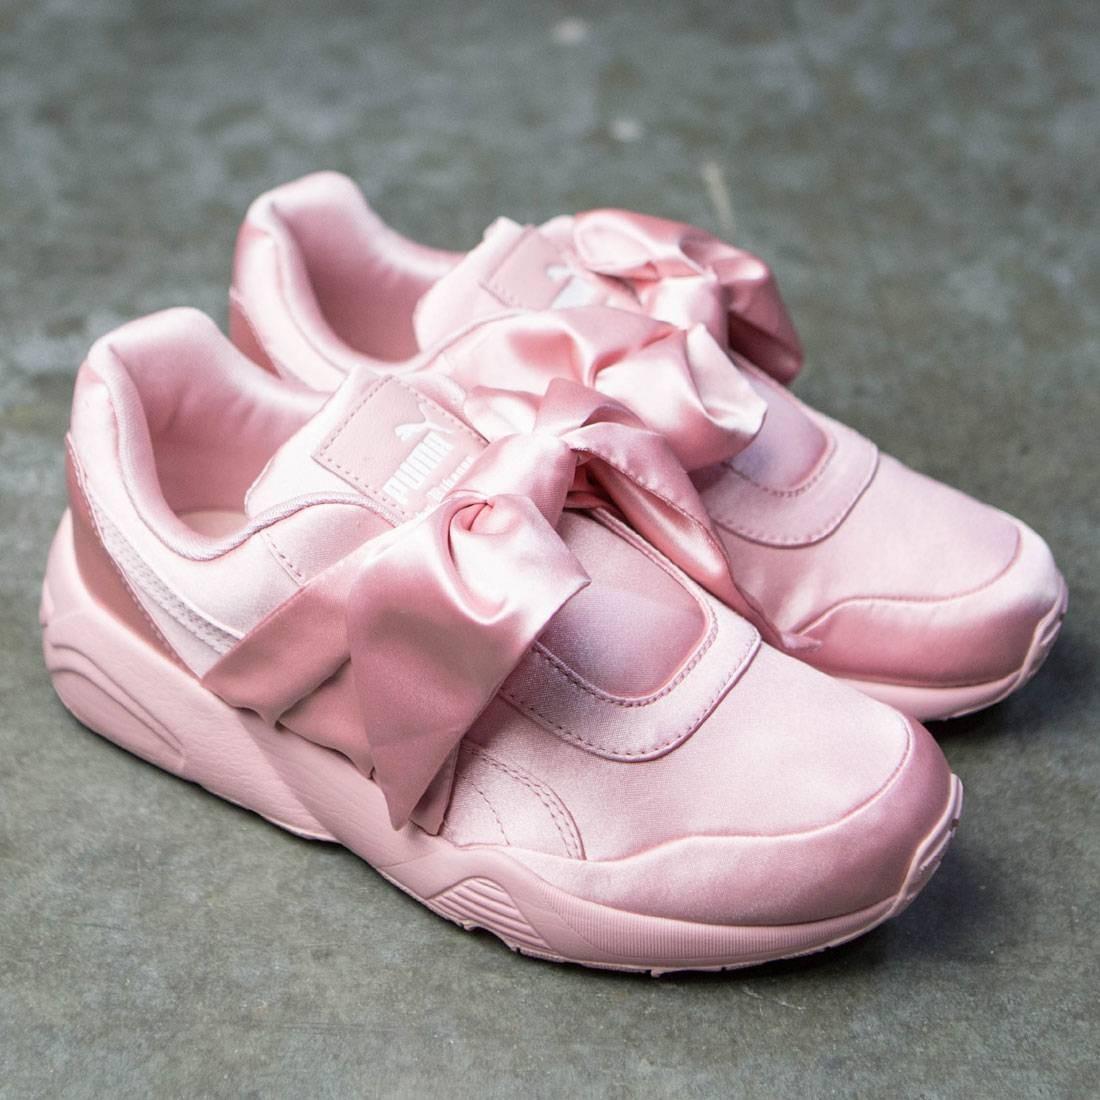 classic fit 8fdf5 3983d Puma x Fenty By Rihanna Women Bow Sneaker (pink / silver)